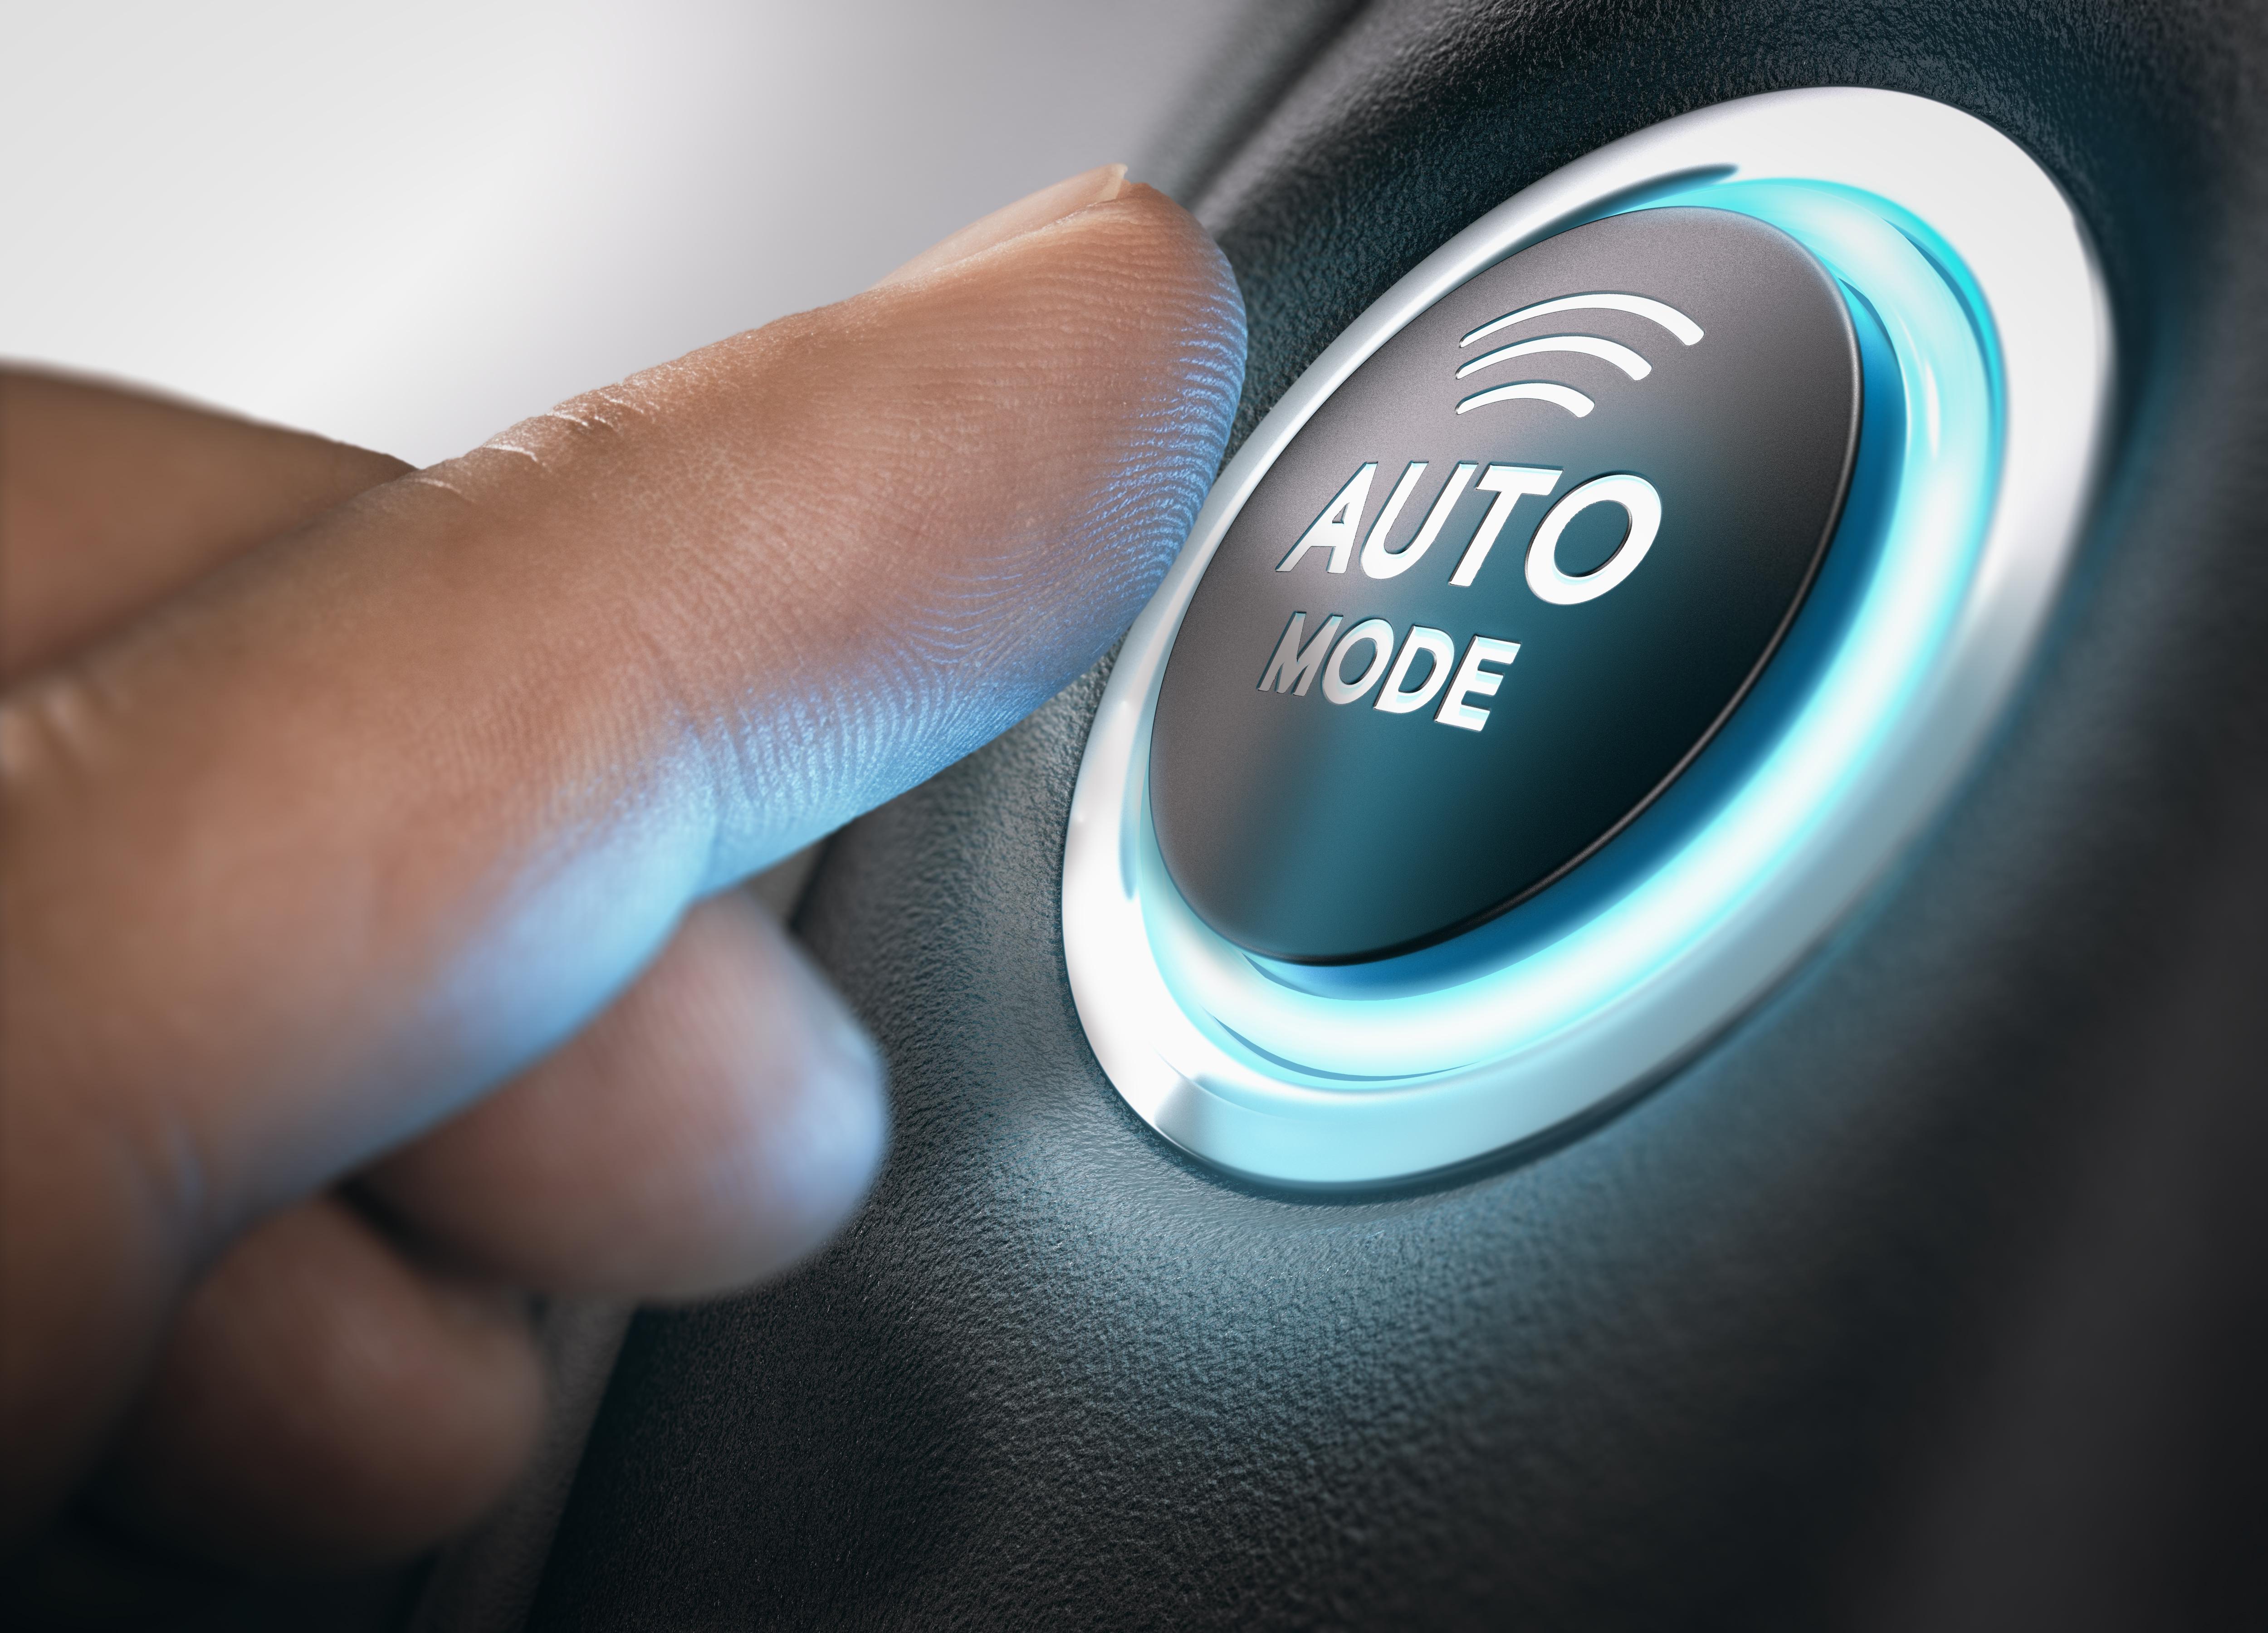 Auto Mode on a car button